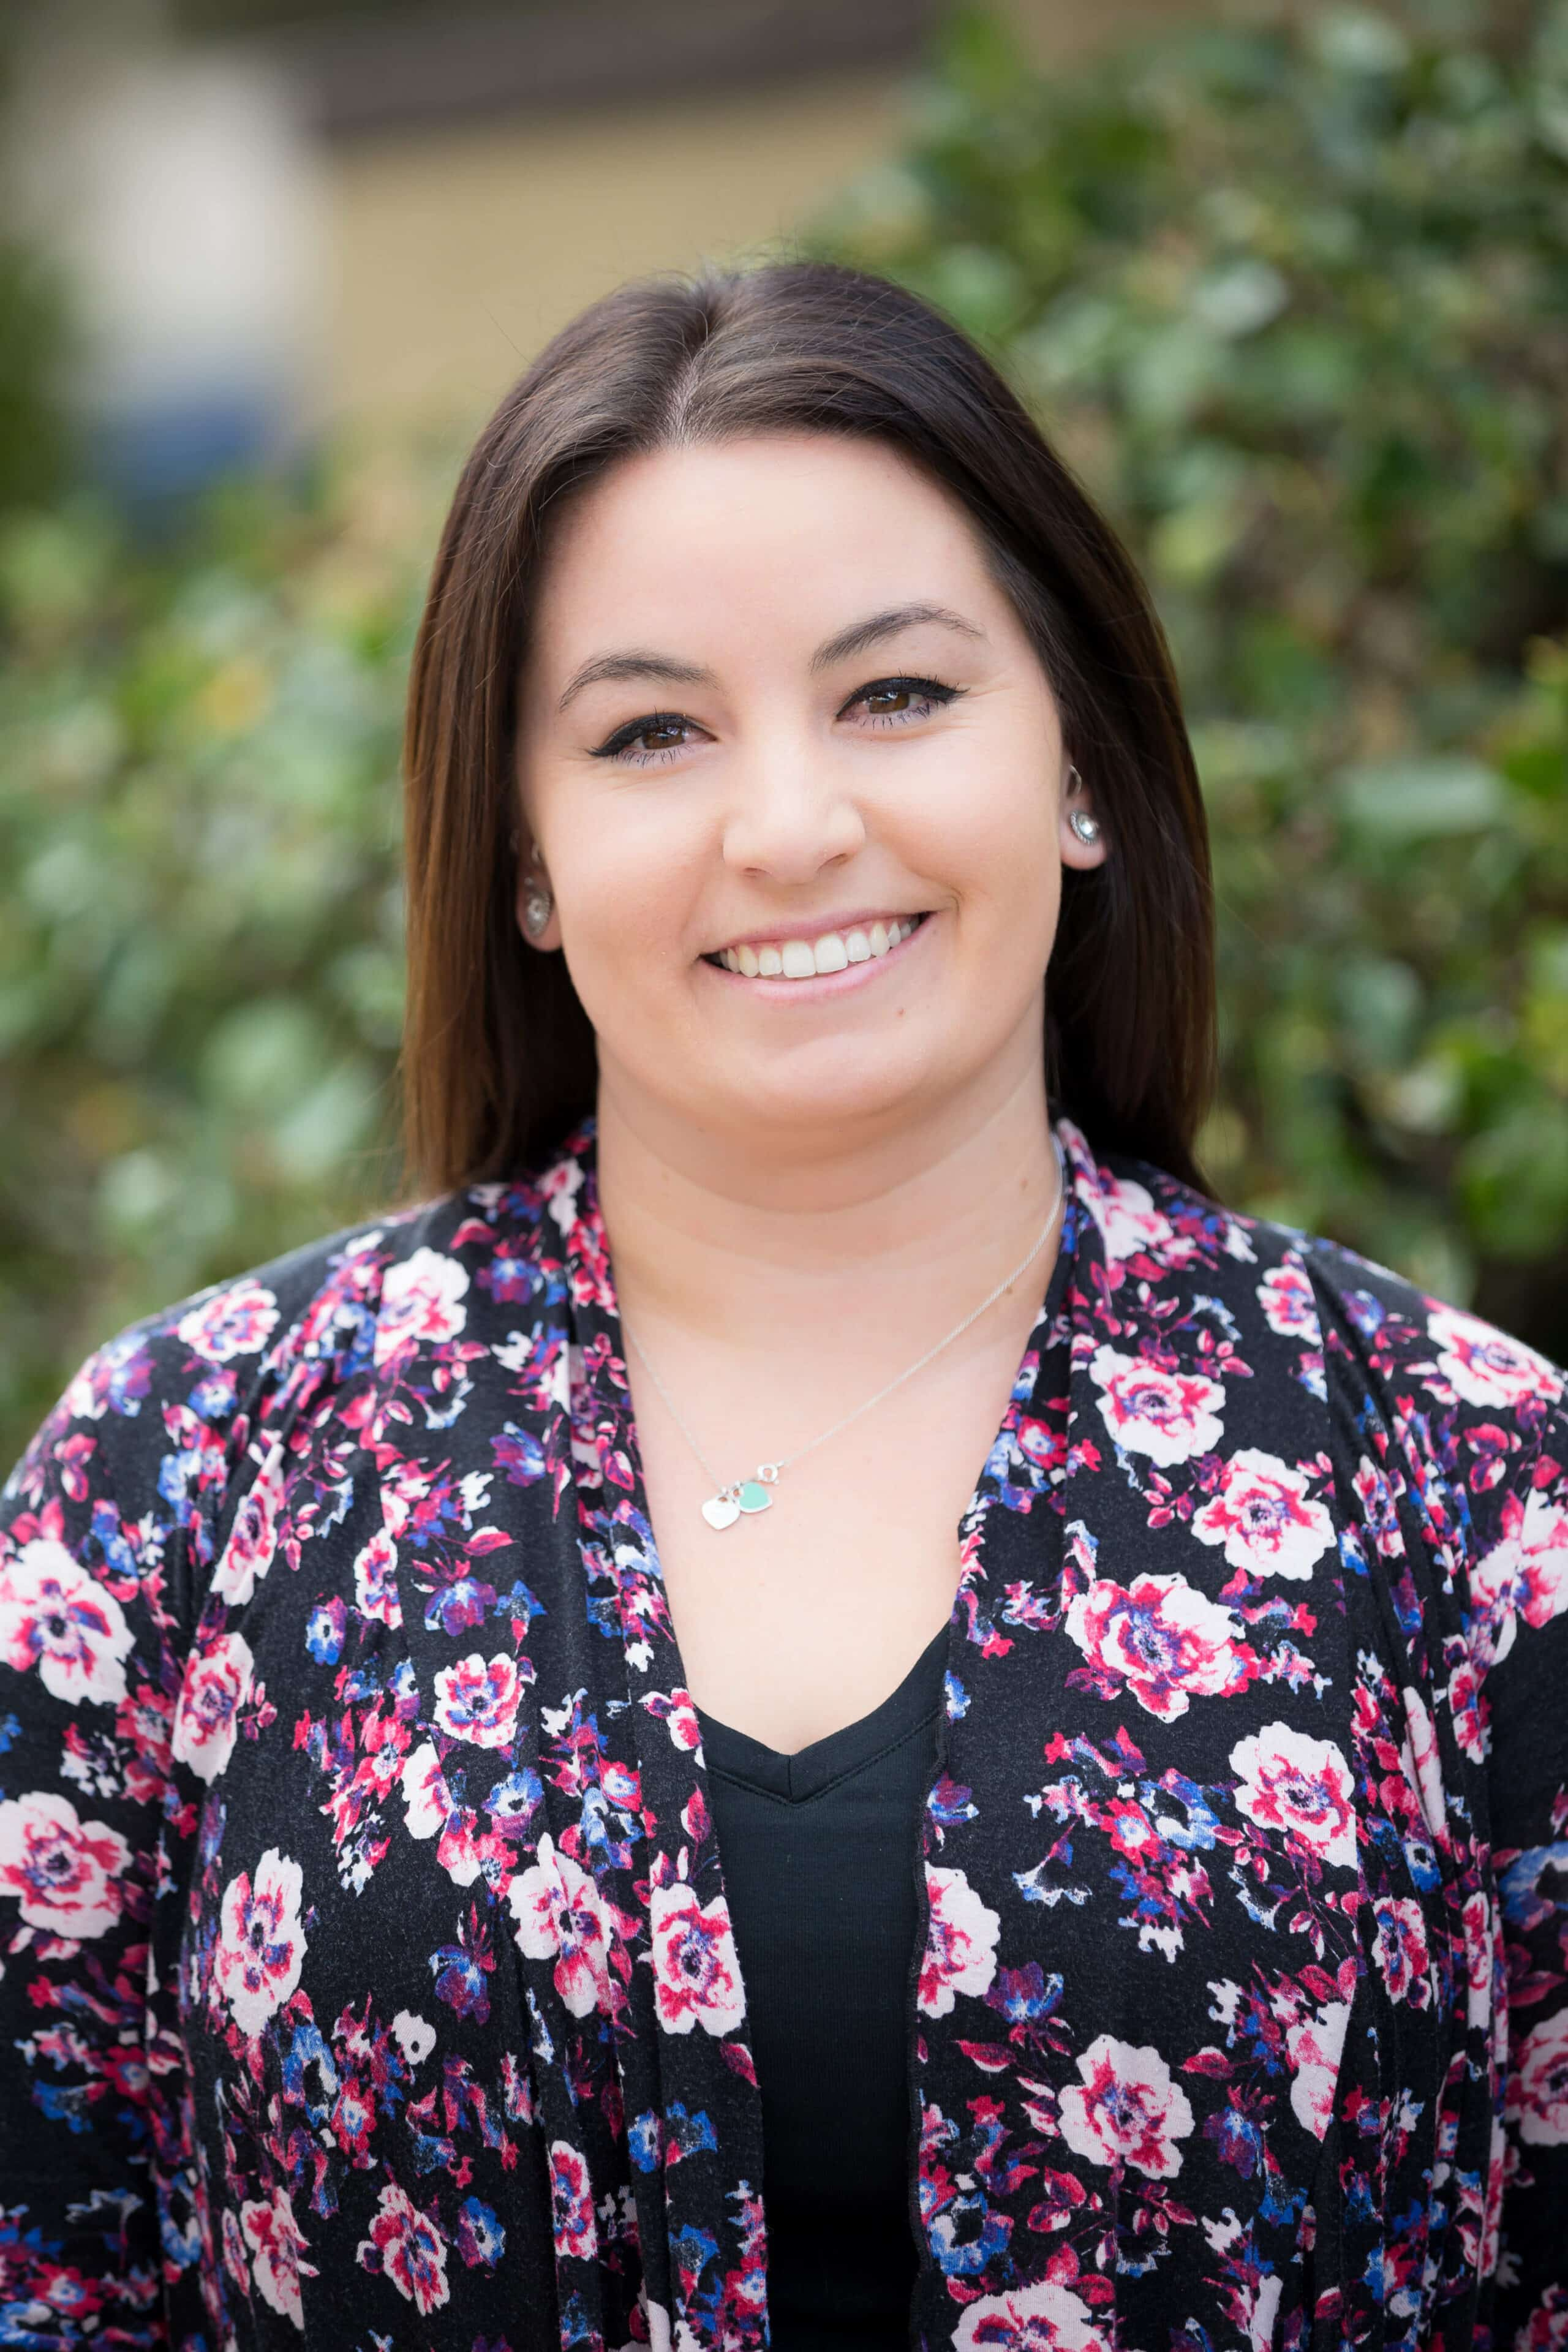 Ashley Flores, Castle Breckenridge - Portfolio Manager